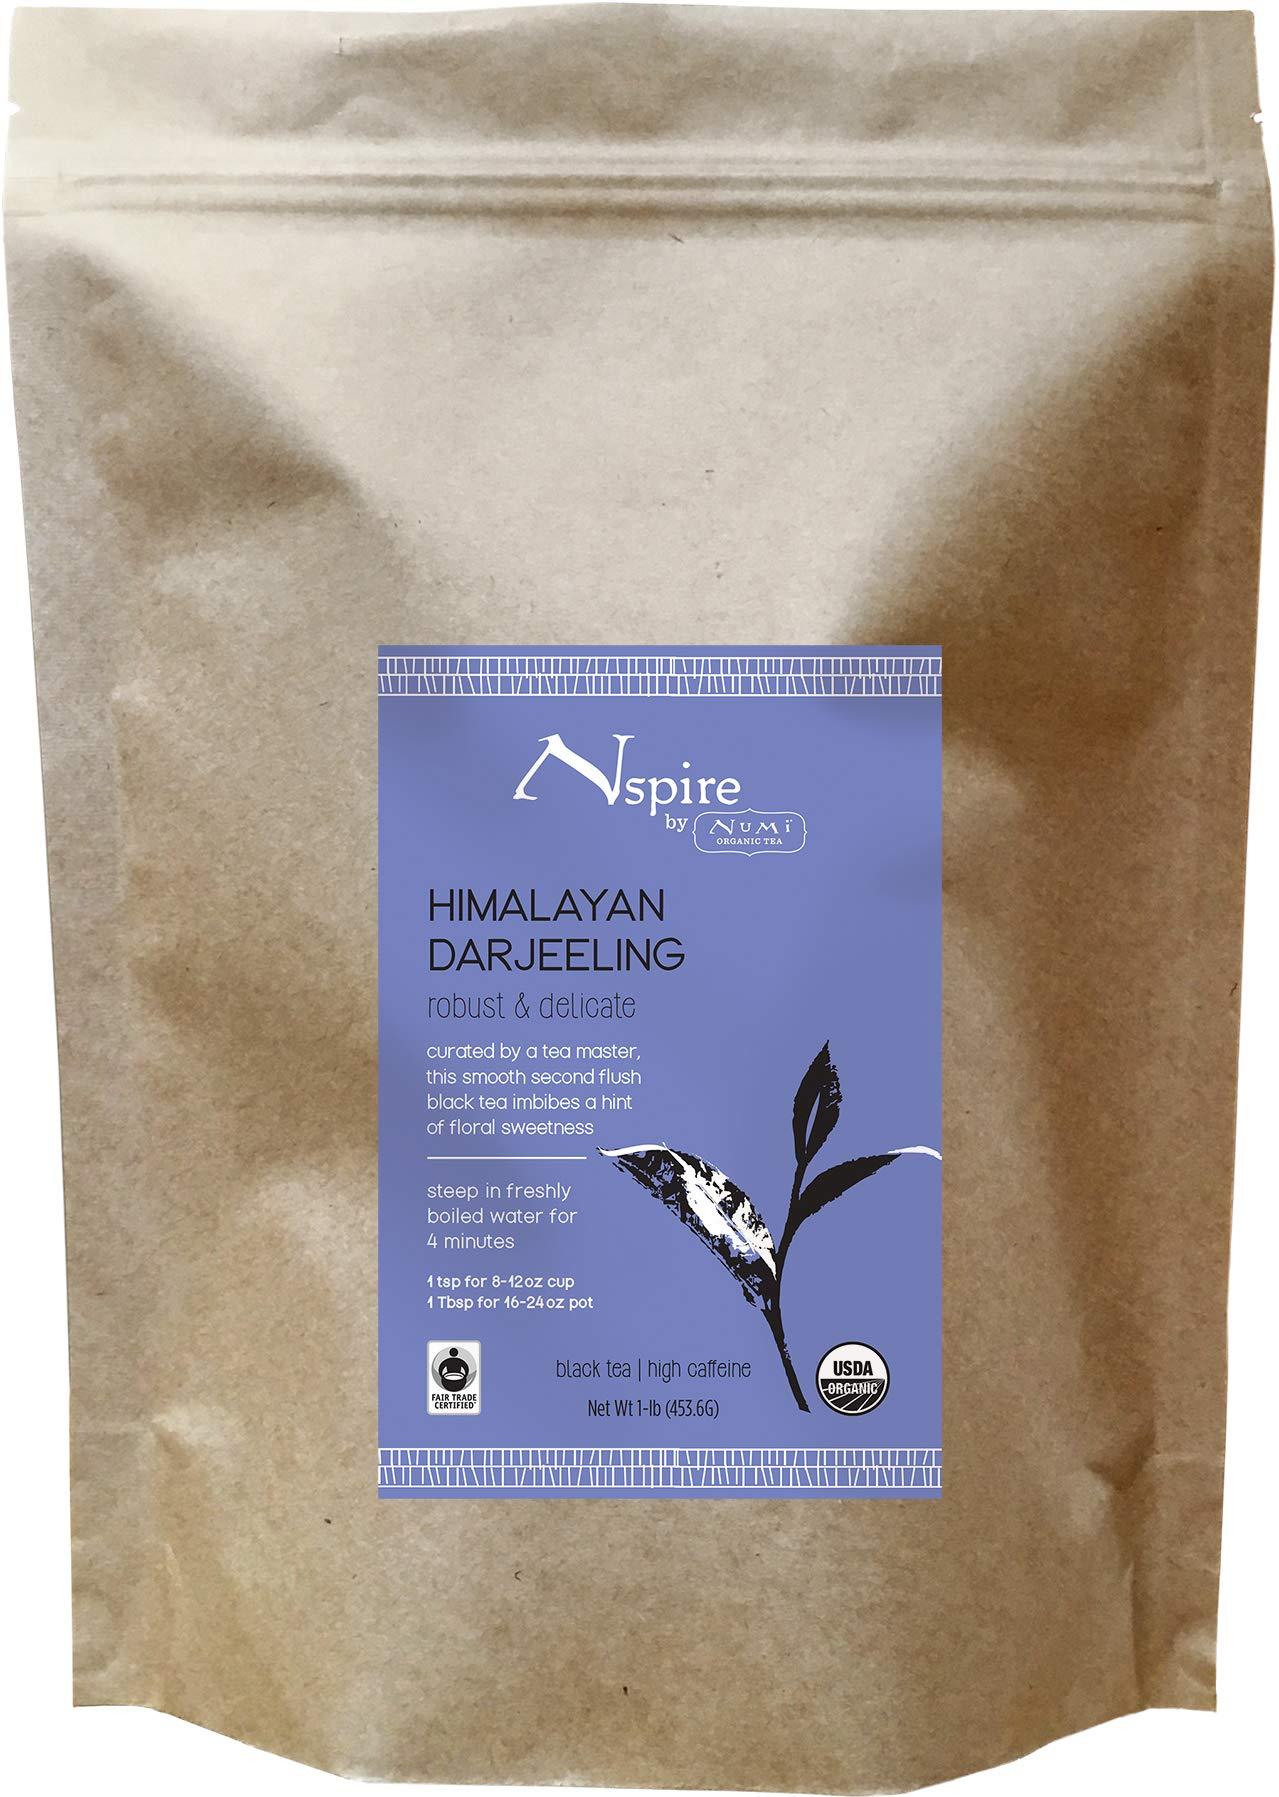 Nspire by Numi Organic Tea Himalayan Darjeeling, 16 Ounce Pouch, Loose Leaf Black Tea